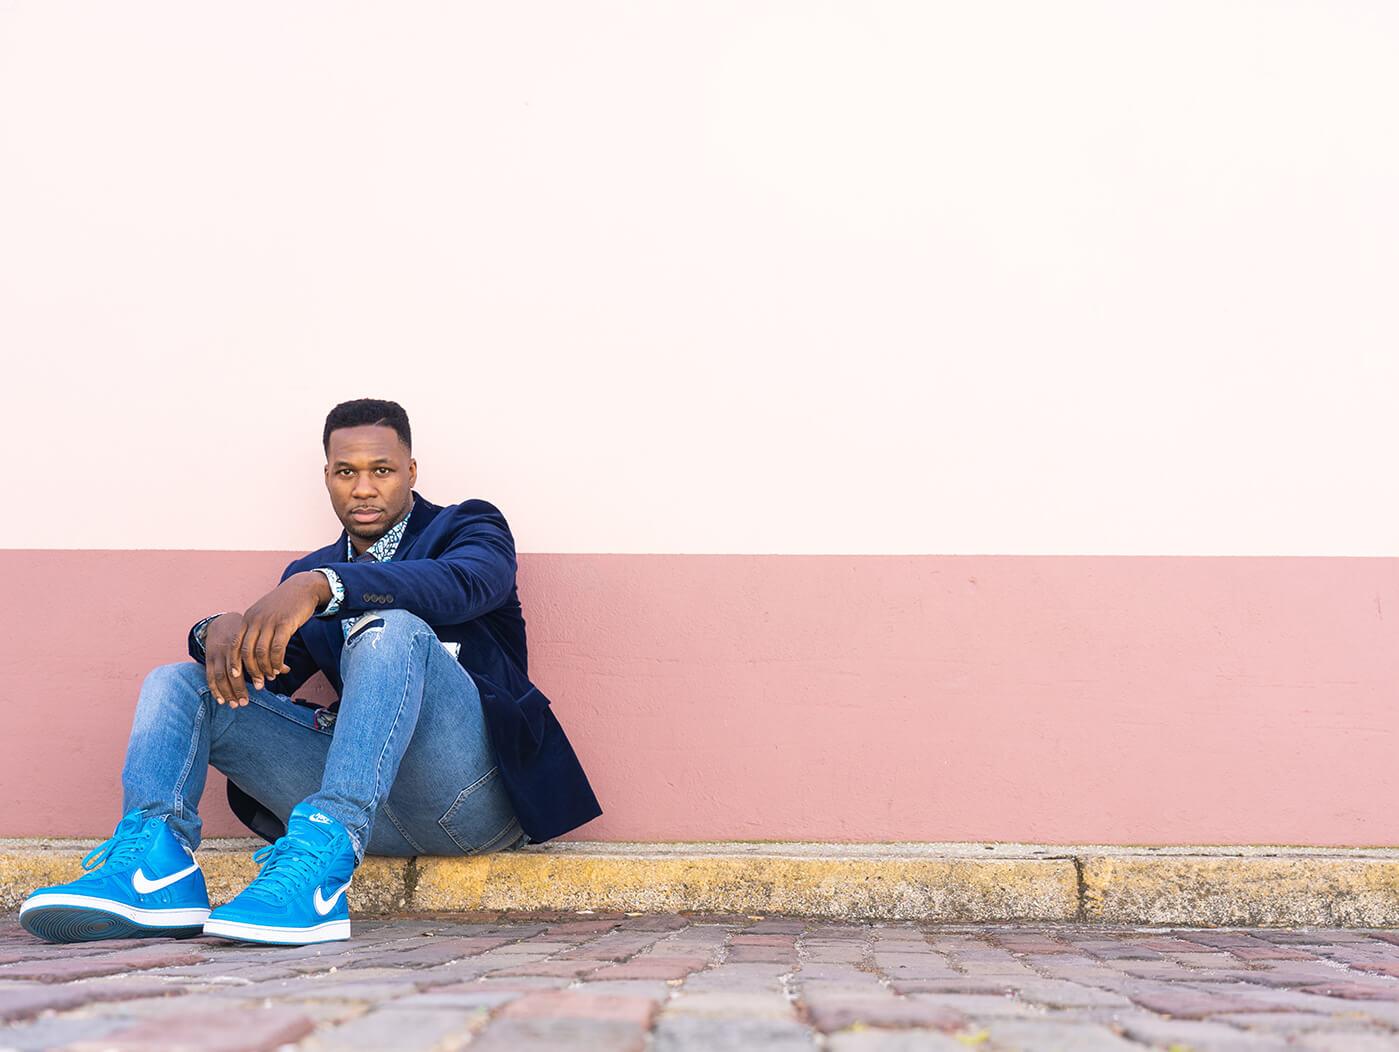 Robert Randolph sitting on sidewalk